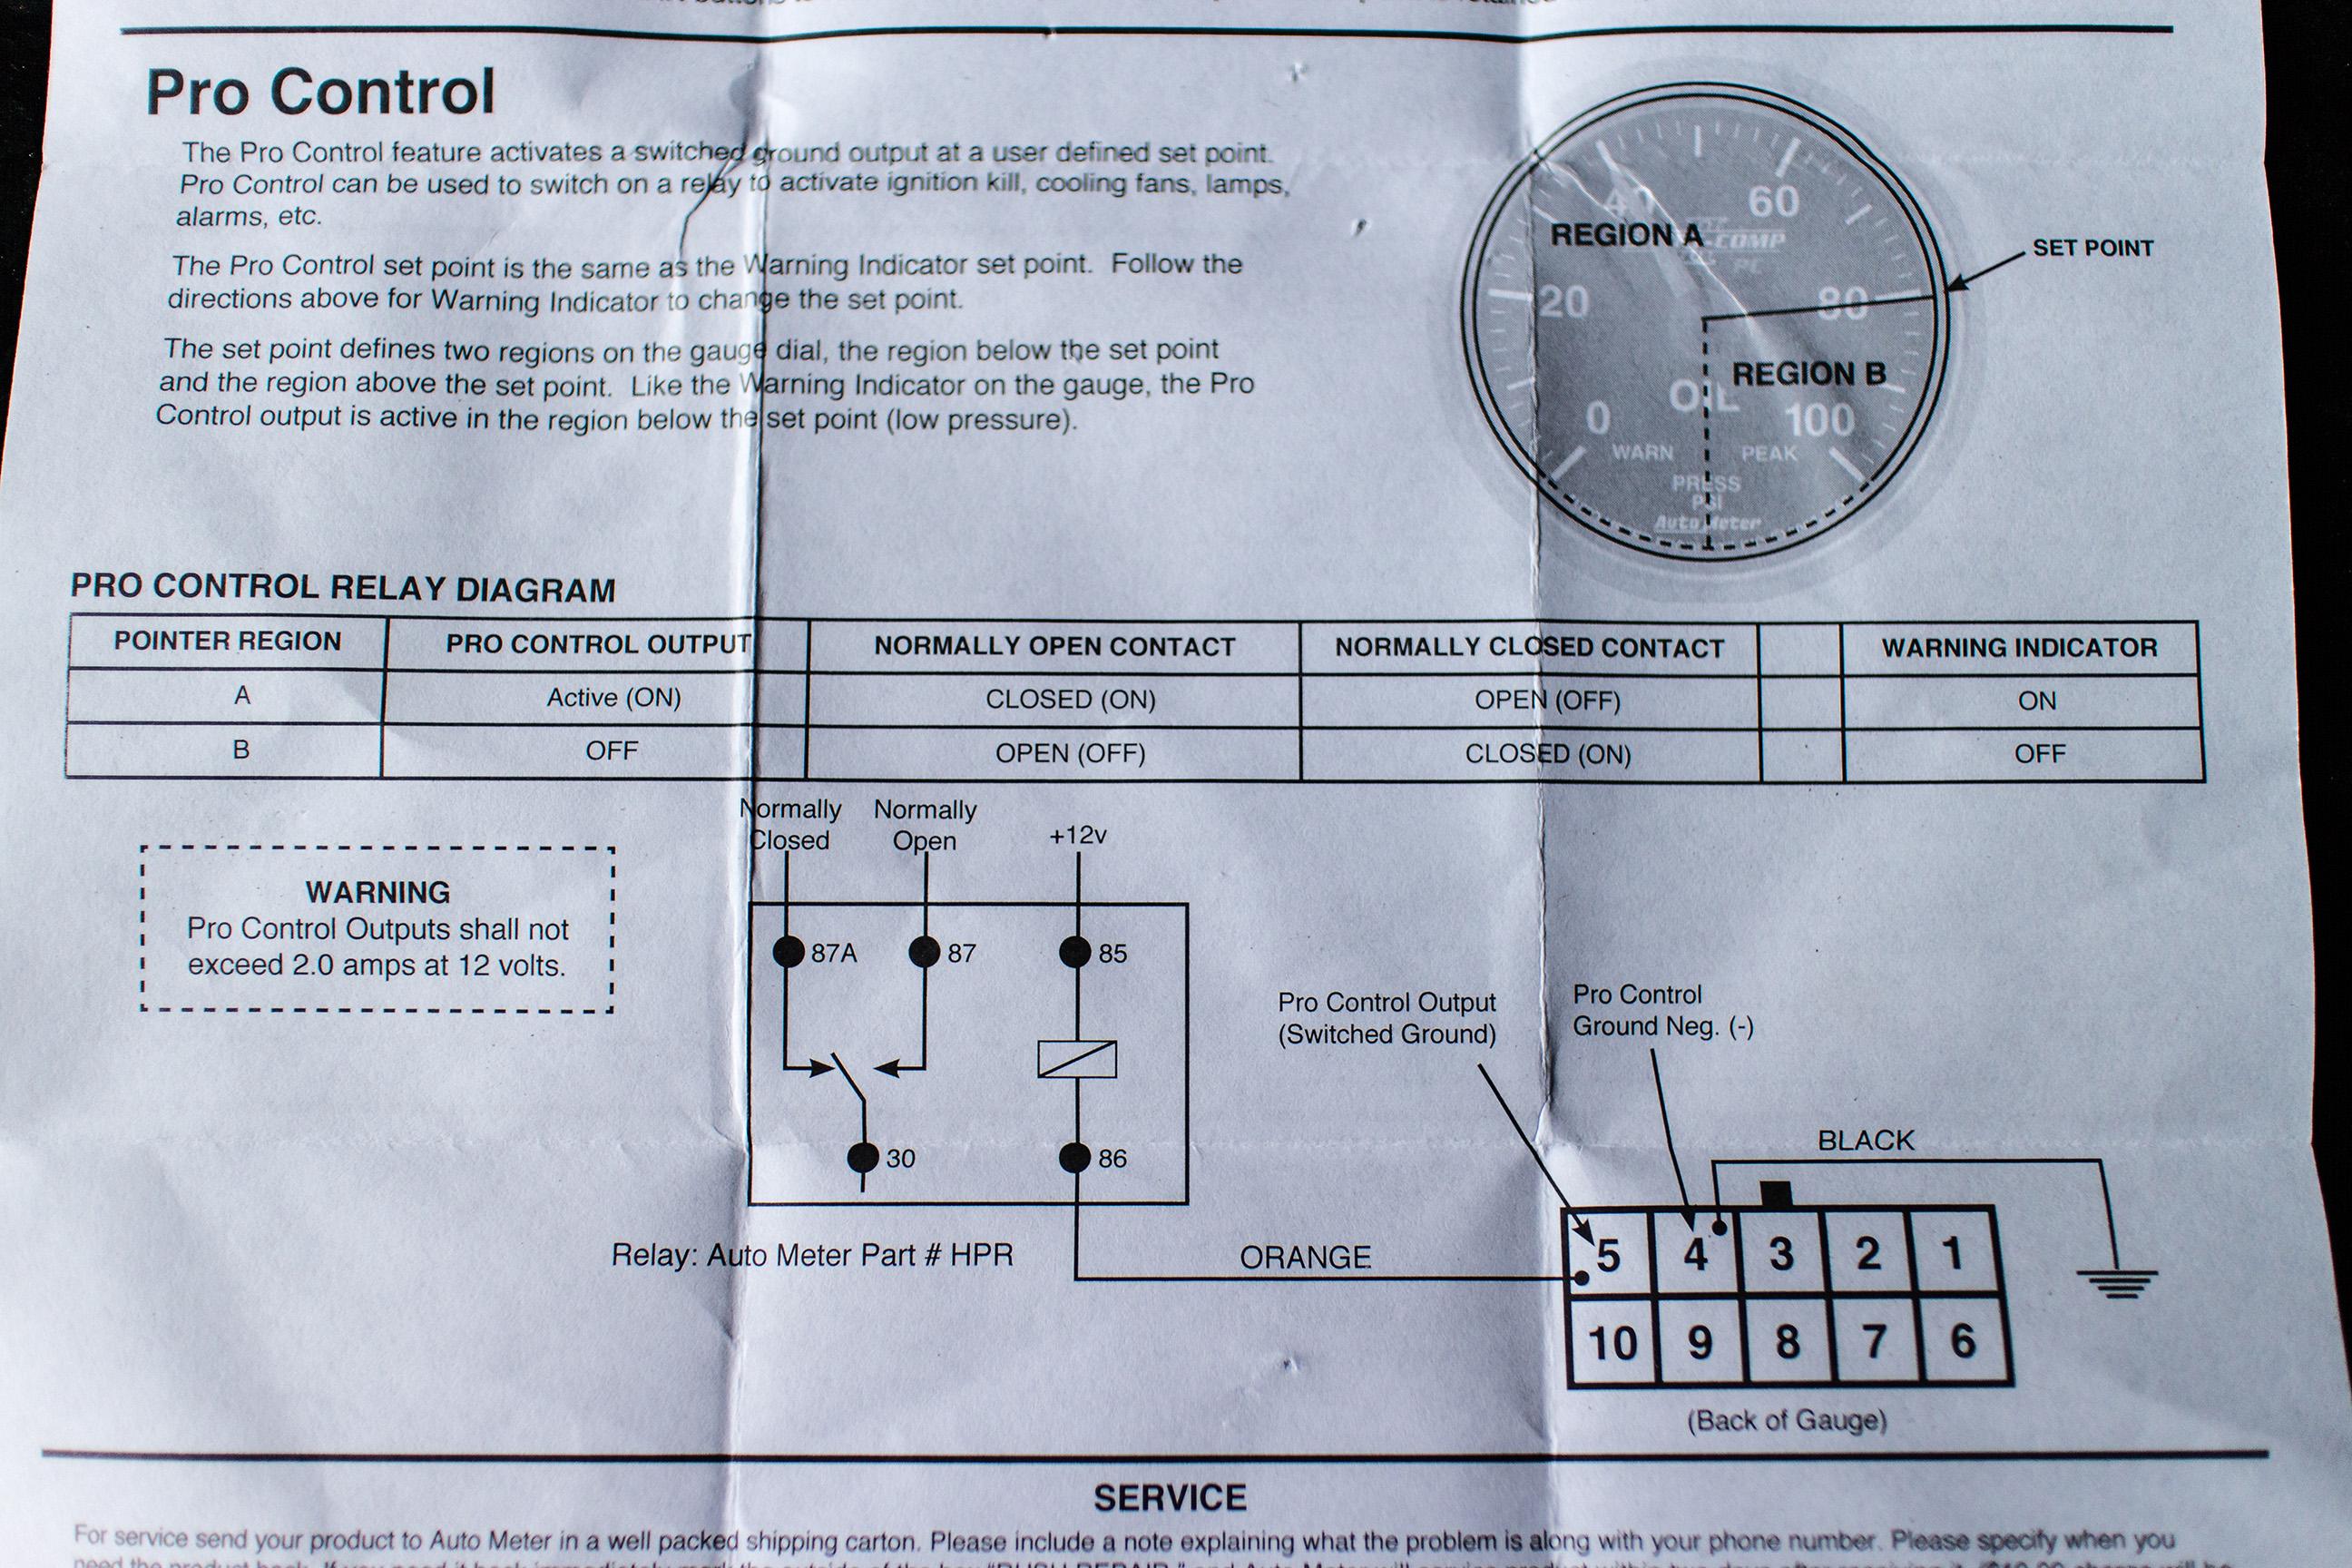 CT_9689] Water Temp Gauge Wiring Diagram On Auto Meter Amp Gauge Wiring  Diagram Free DiagramSubc Loida Papxe Arcin Benkeme Mohammedshrine Librar Wiring 101